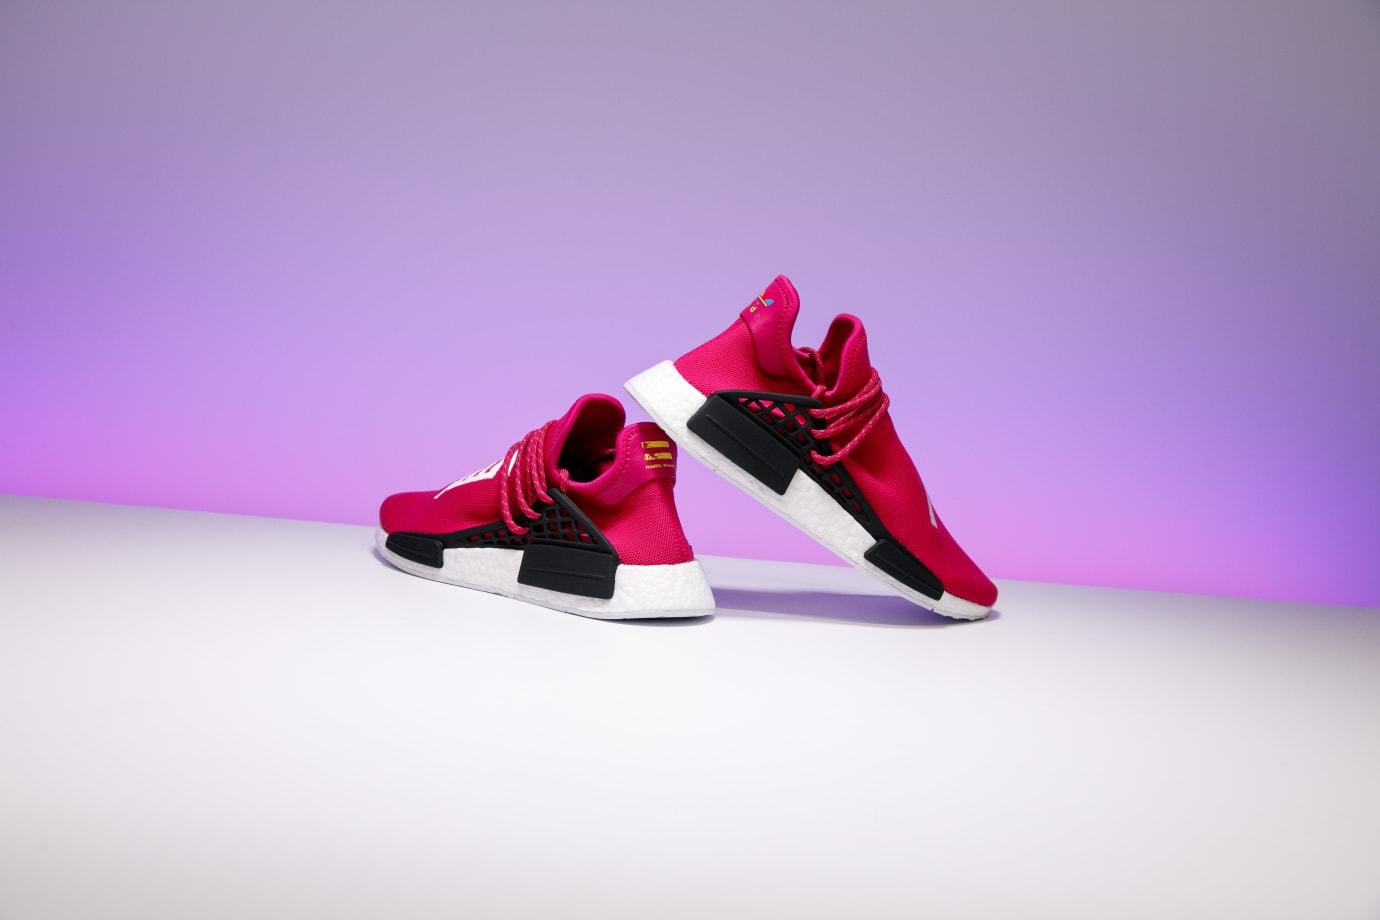 newest collection 1c623 c897a Stadium Goods Pharrell x Adidas NMD Human Race Auction ...